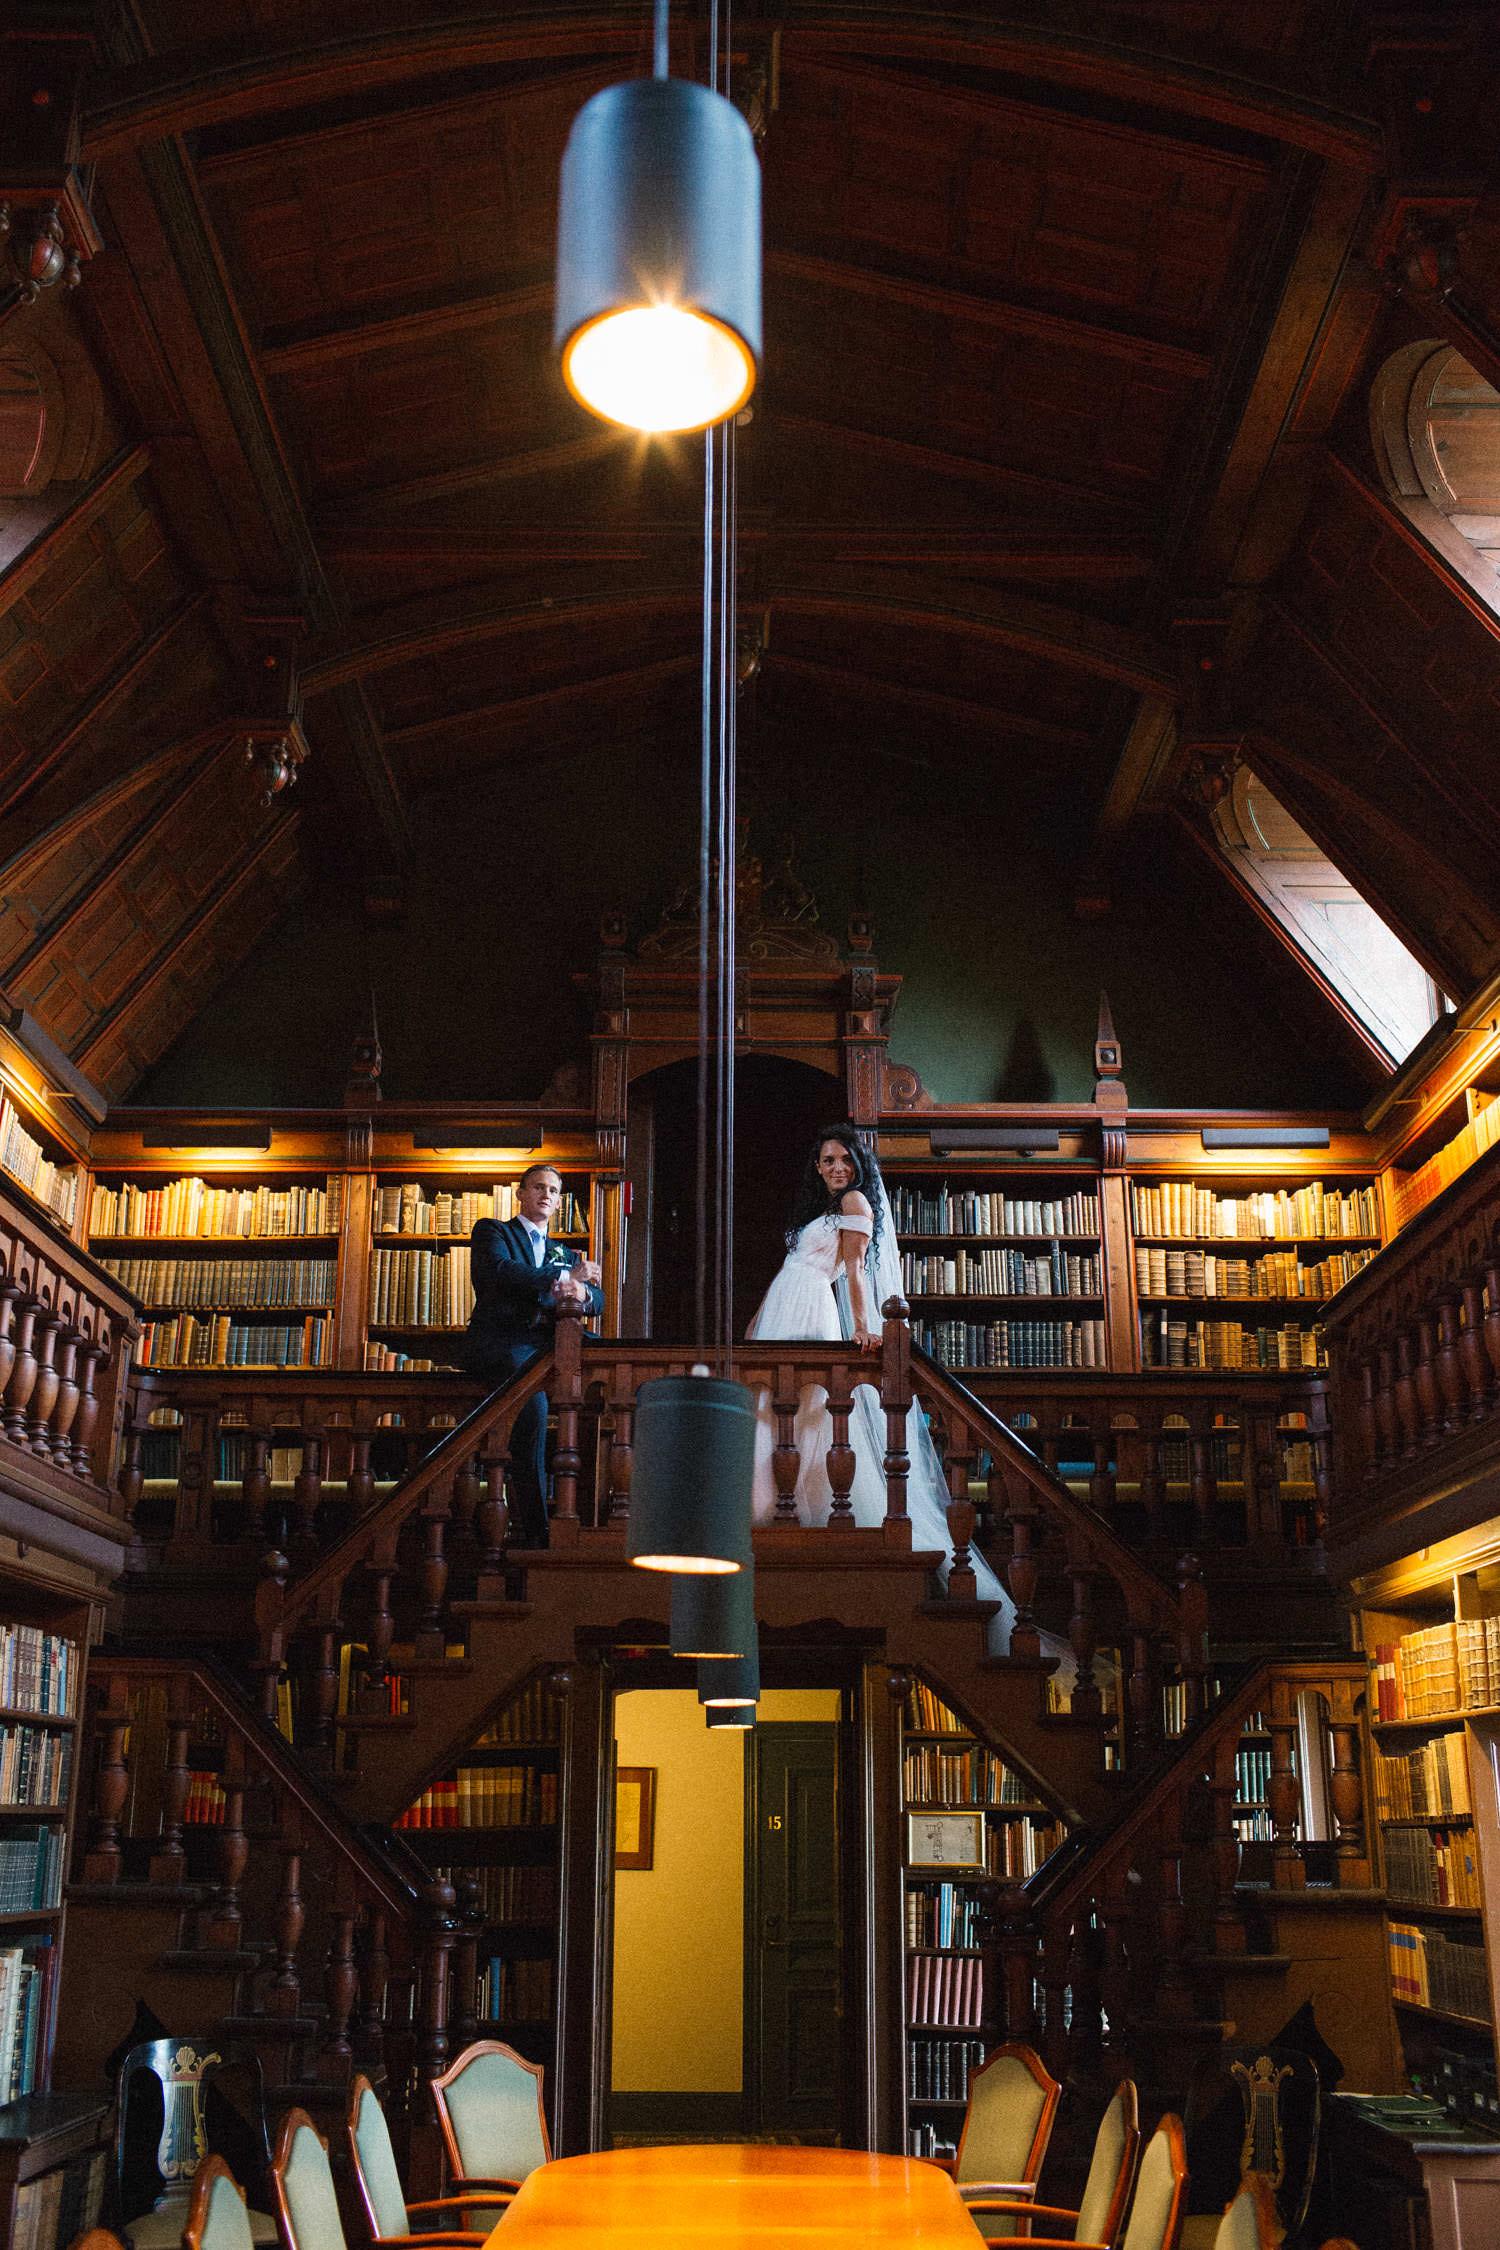 Bild på ett brudpar i det privata biblioteket på Trolleholms slott i Skåne